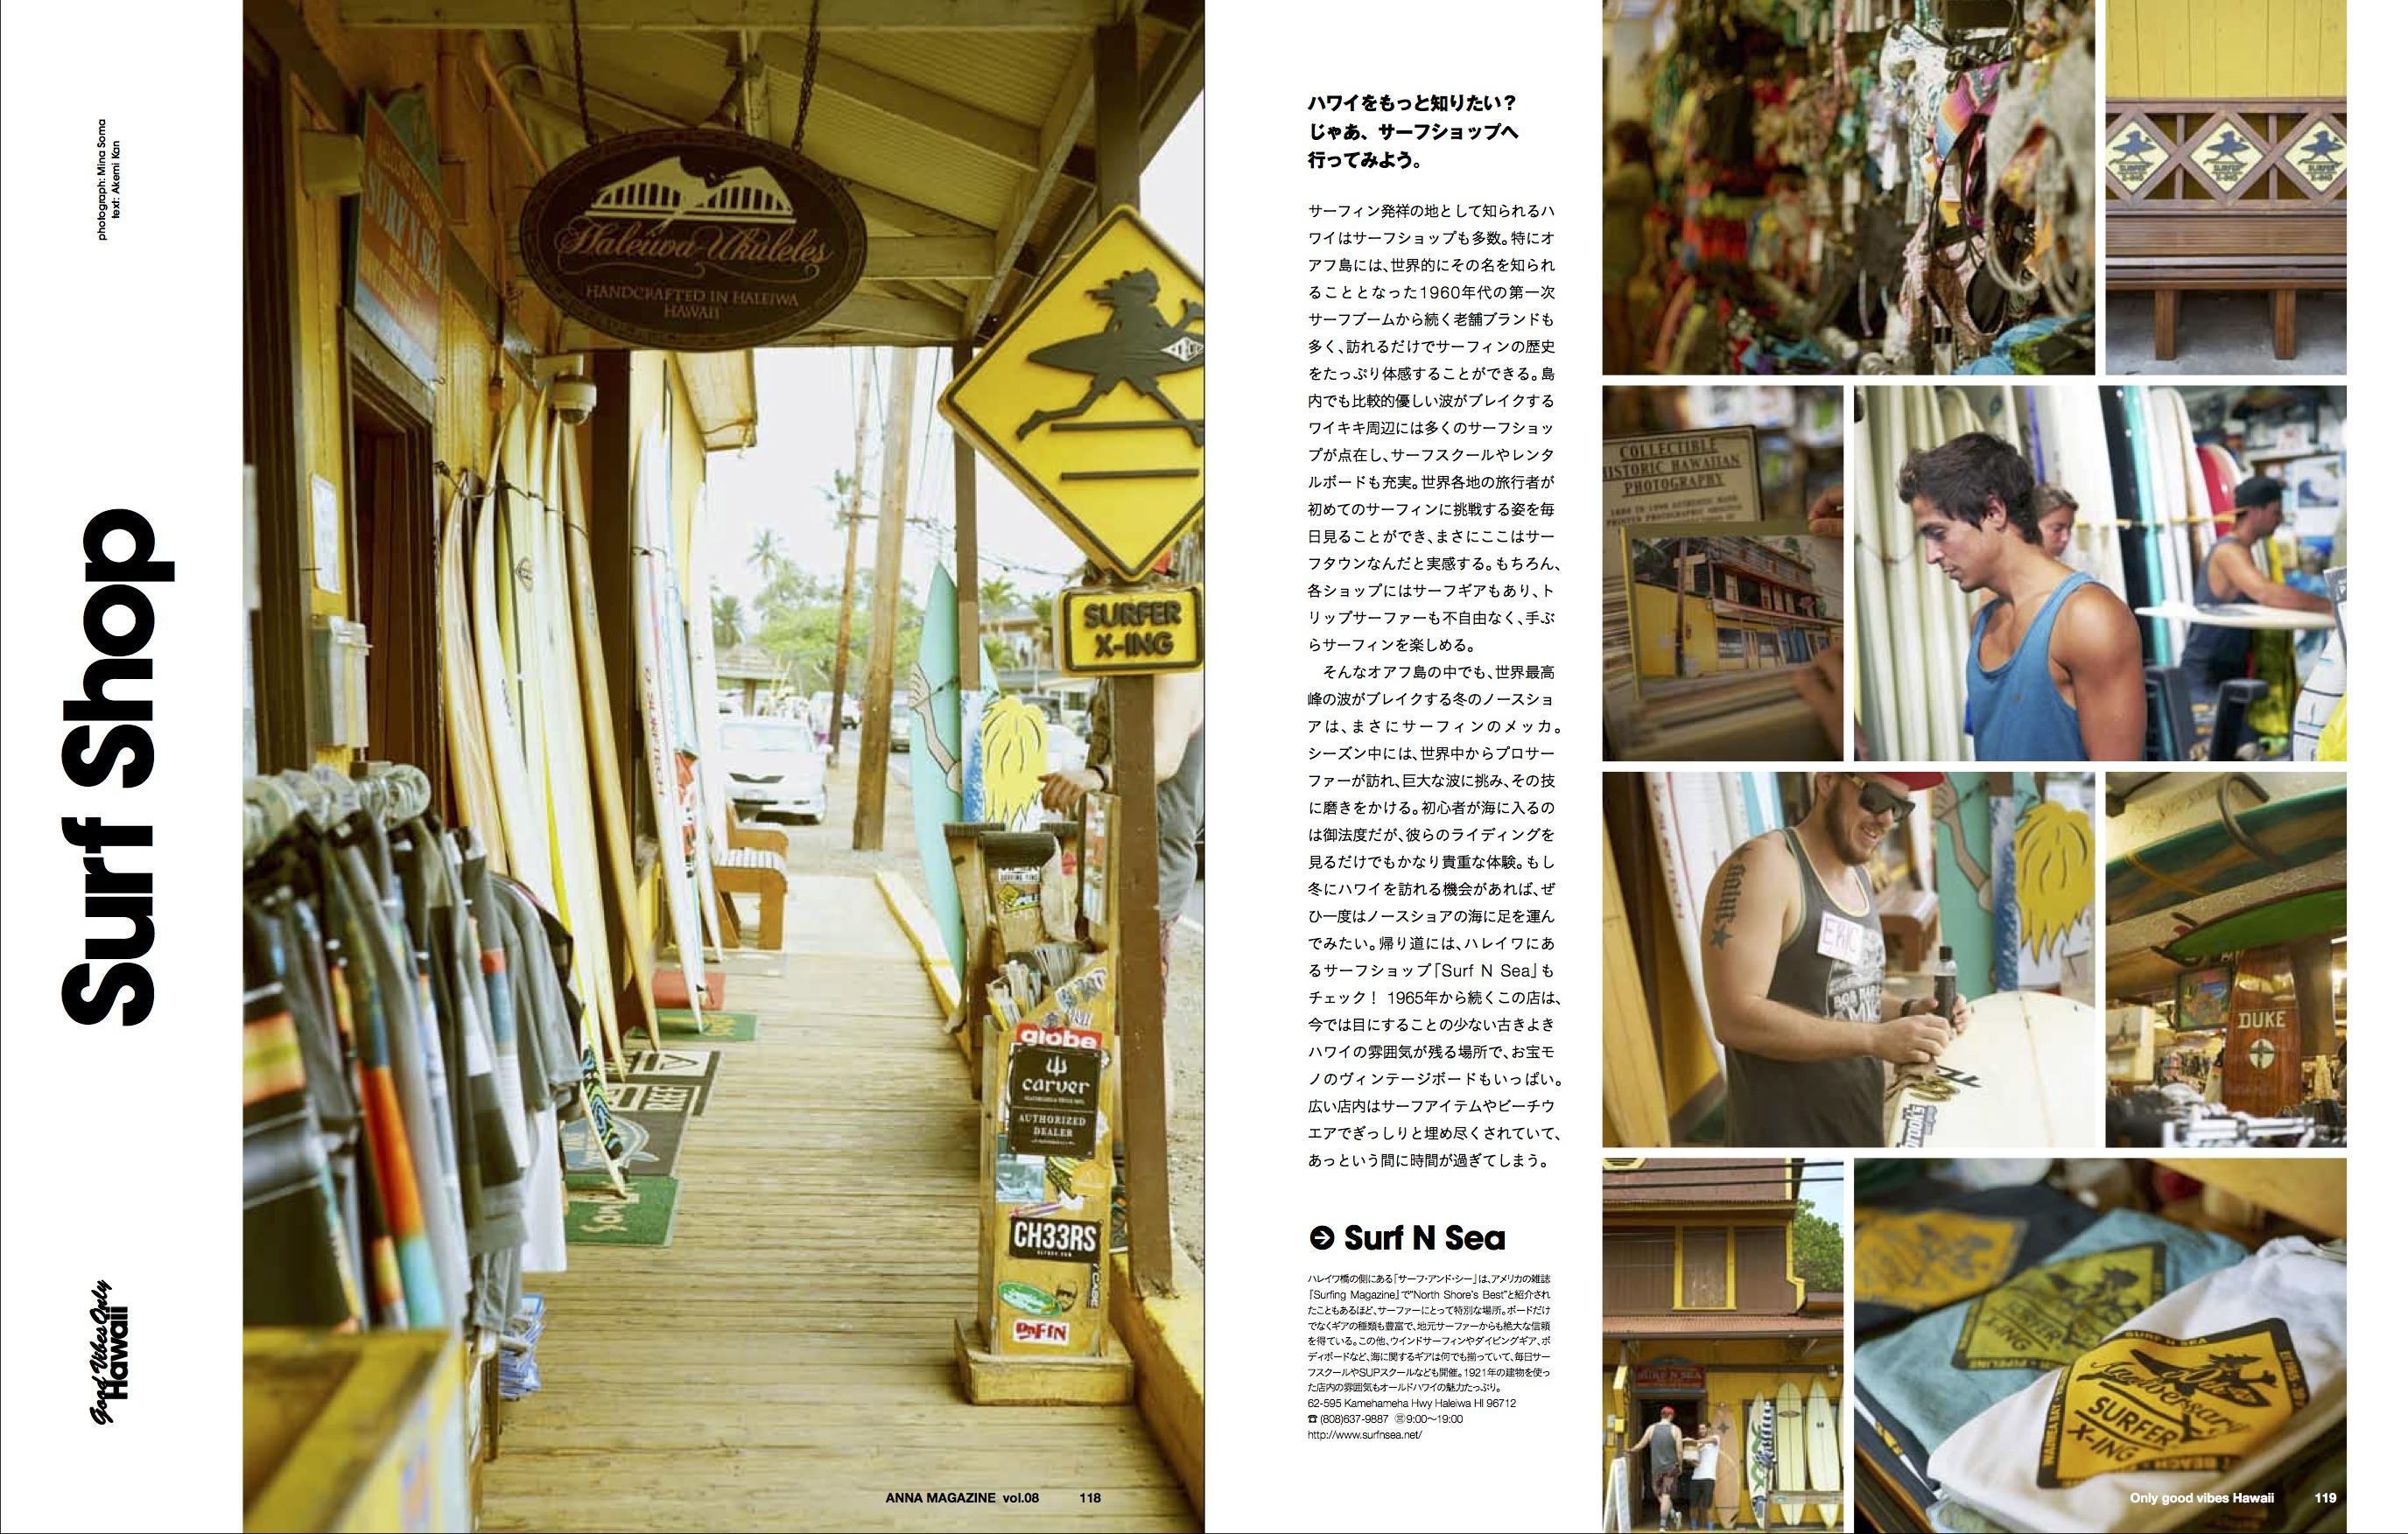 anna magazine vol.8 P57